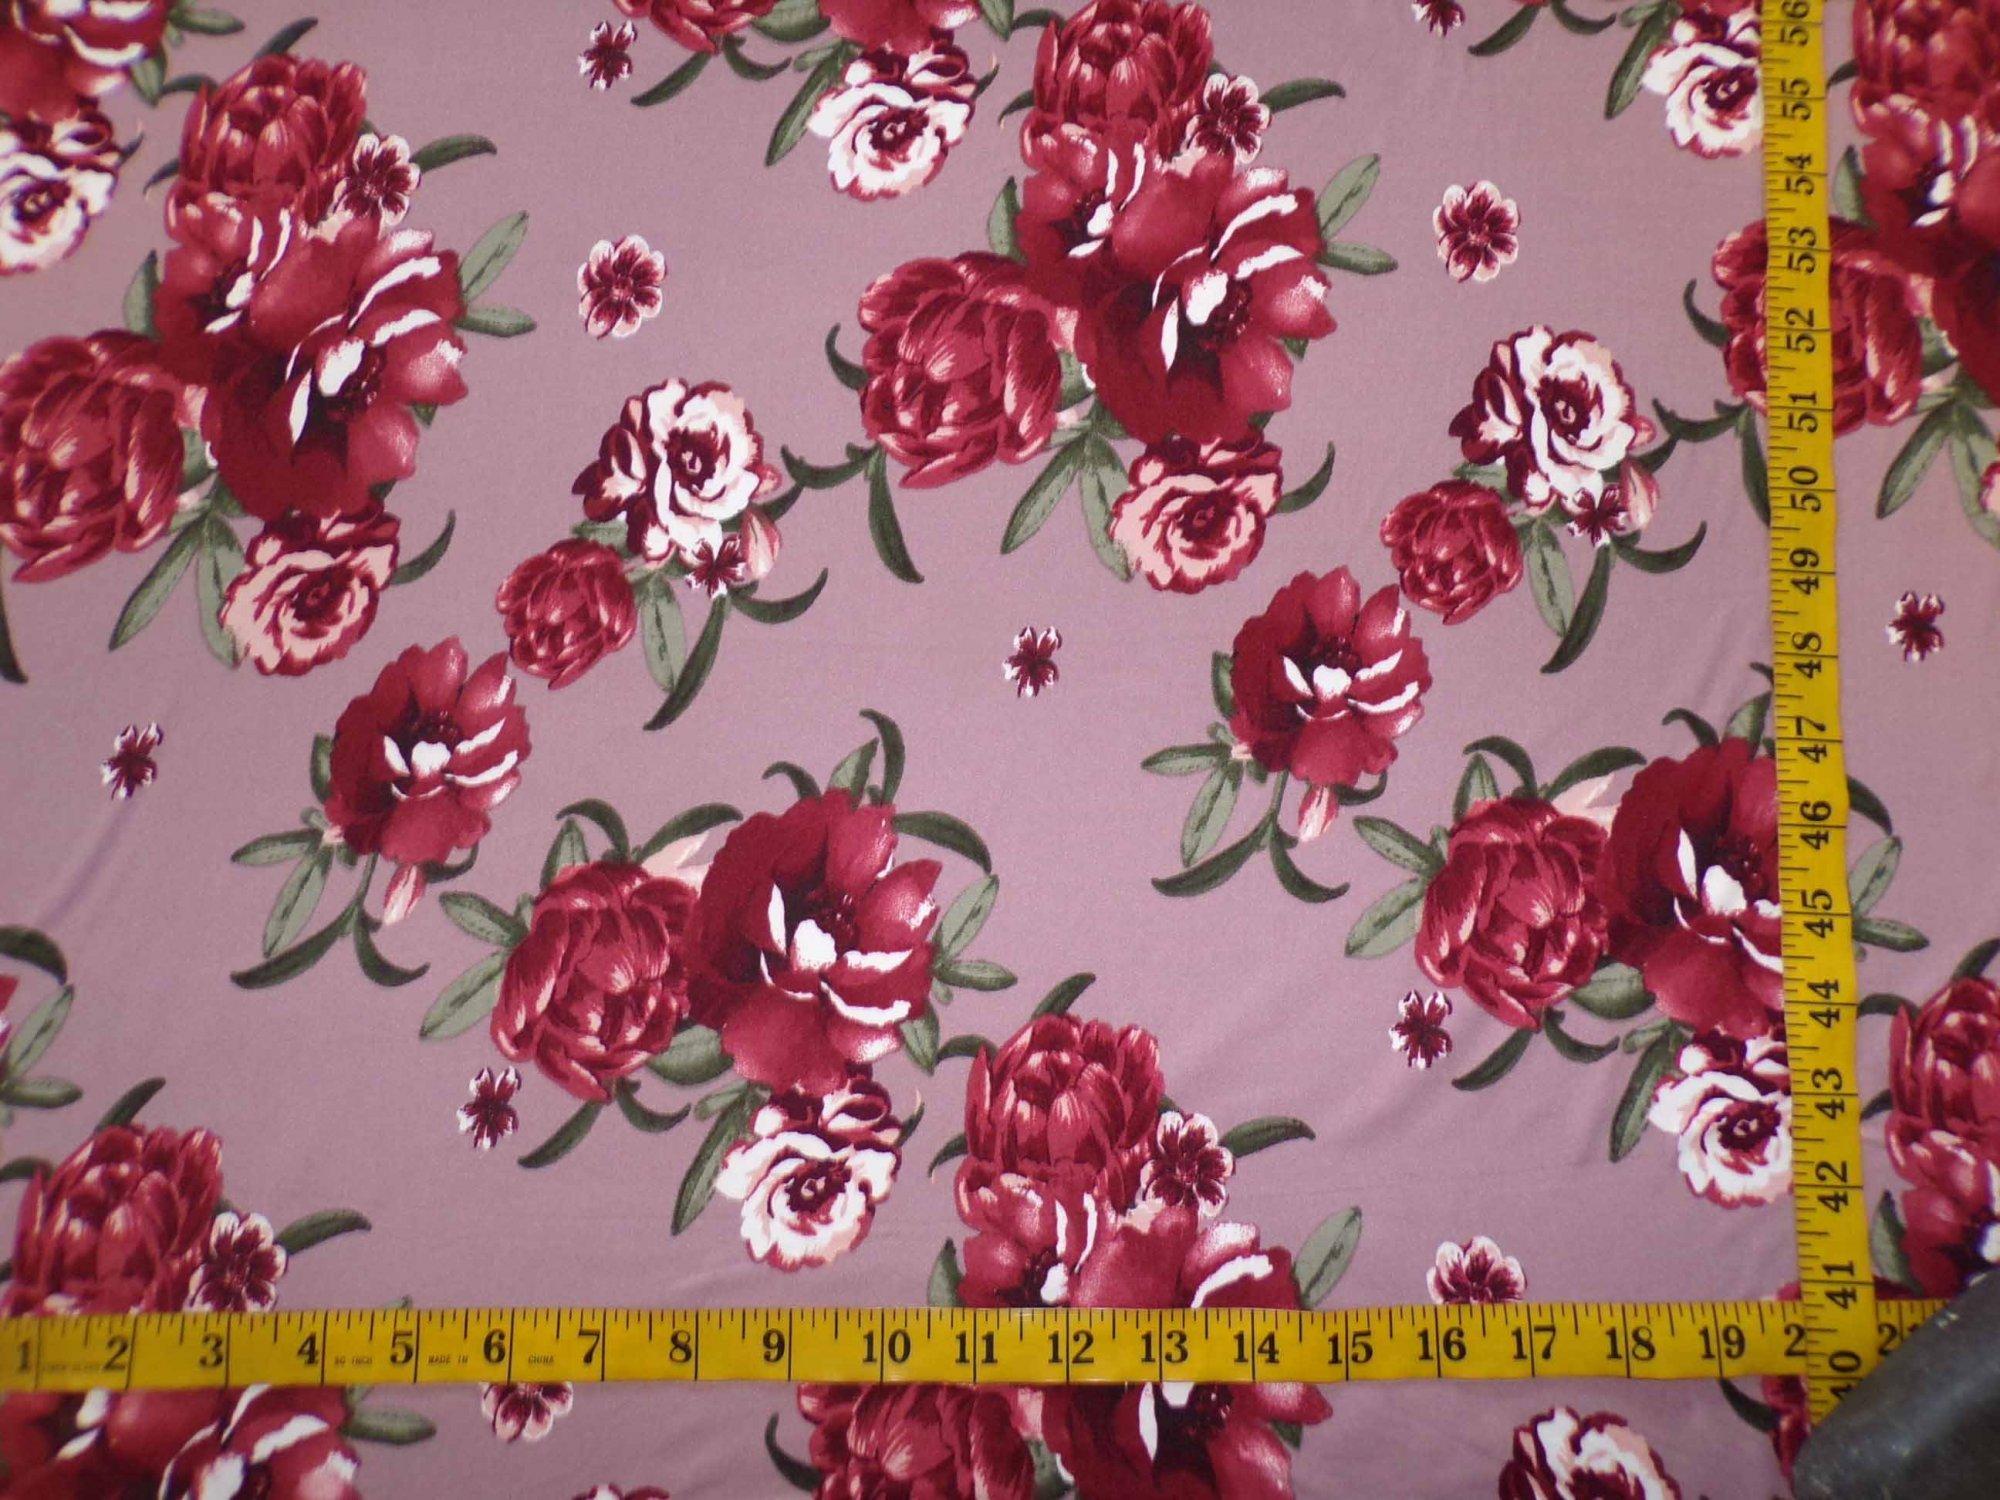 Milana (DBP) - Mauve and Dark Peach Floral